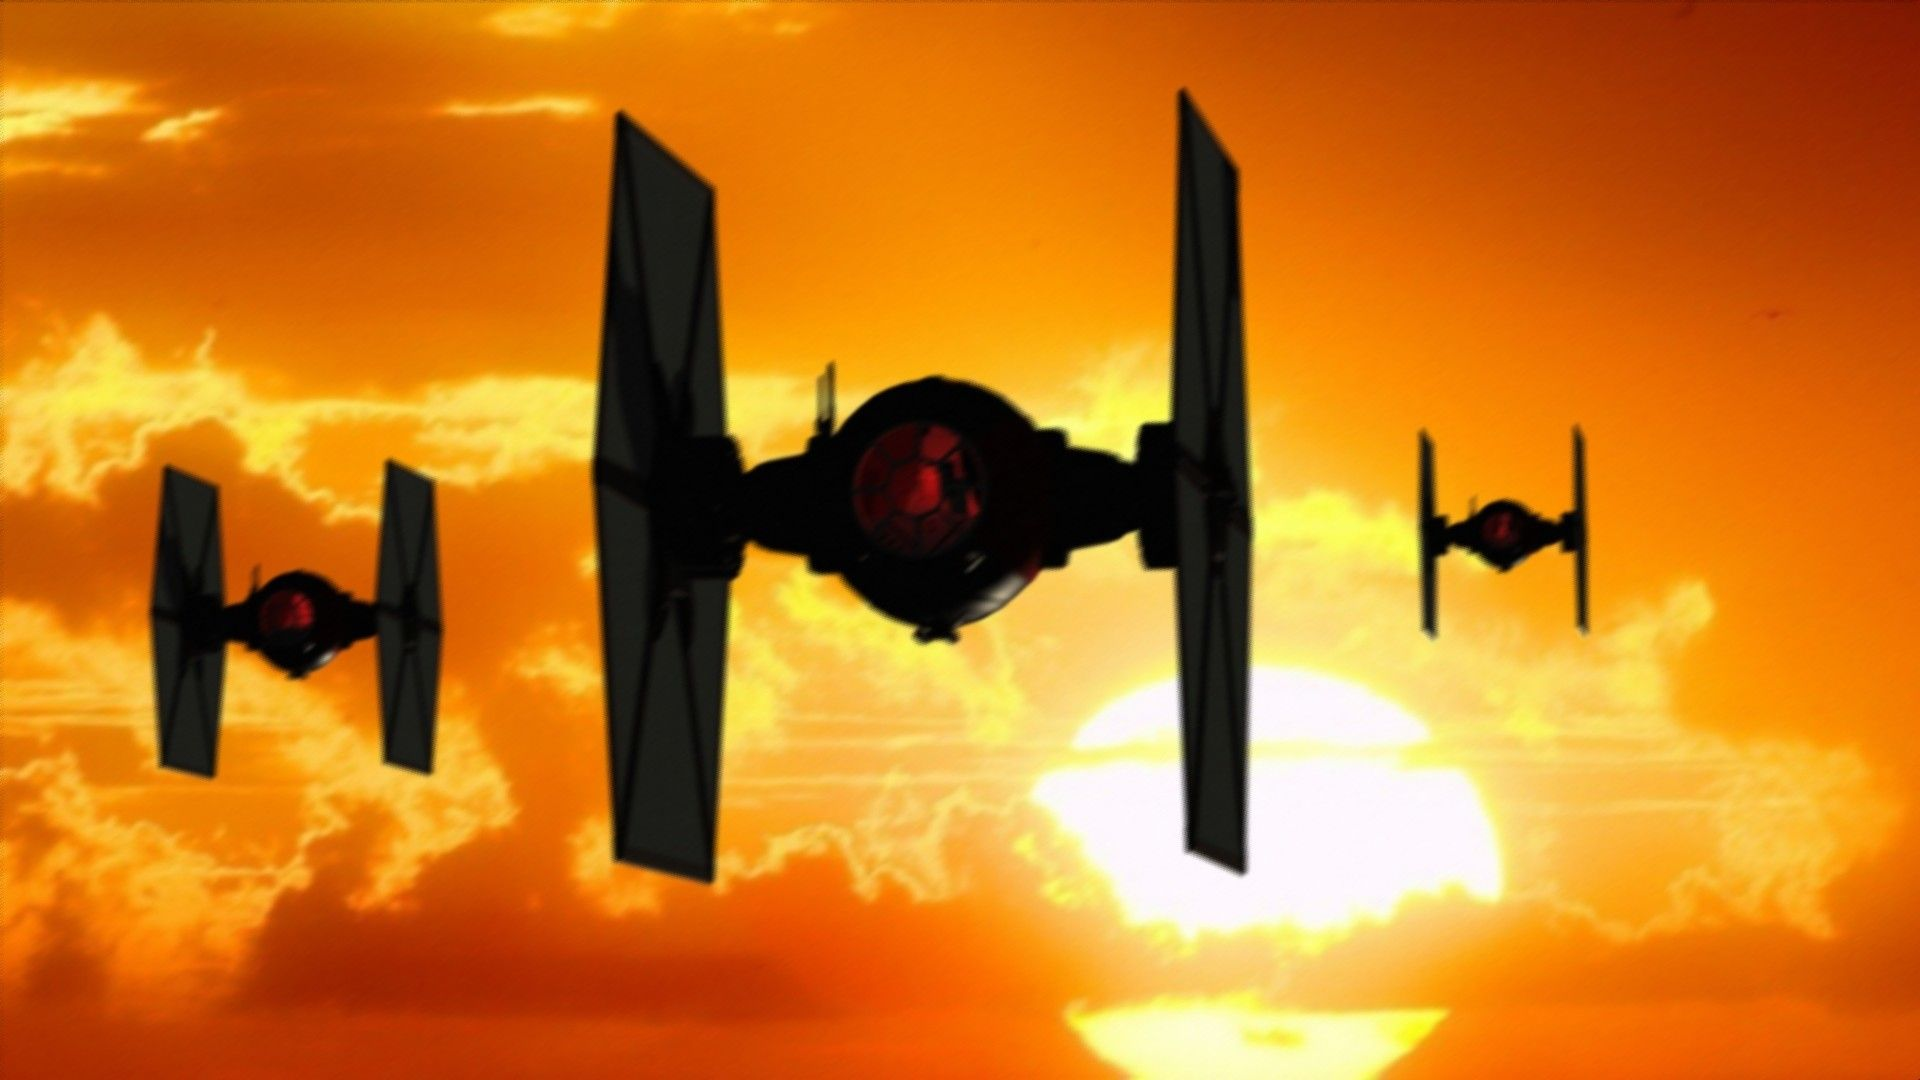 Star Wars Mobile Art Tie Fighter Wallpapers Wallpaper Cave